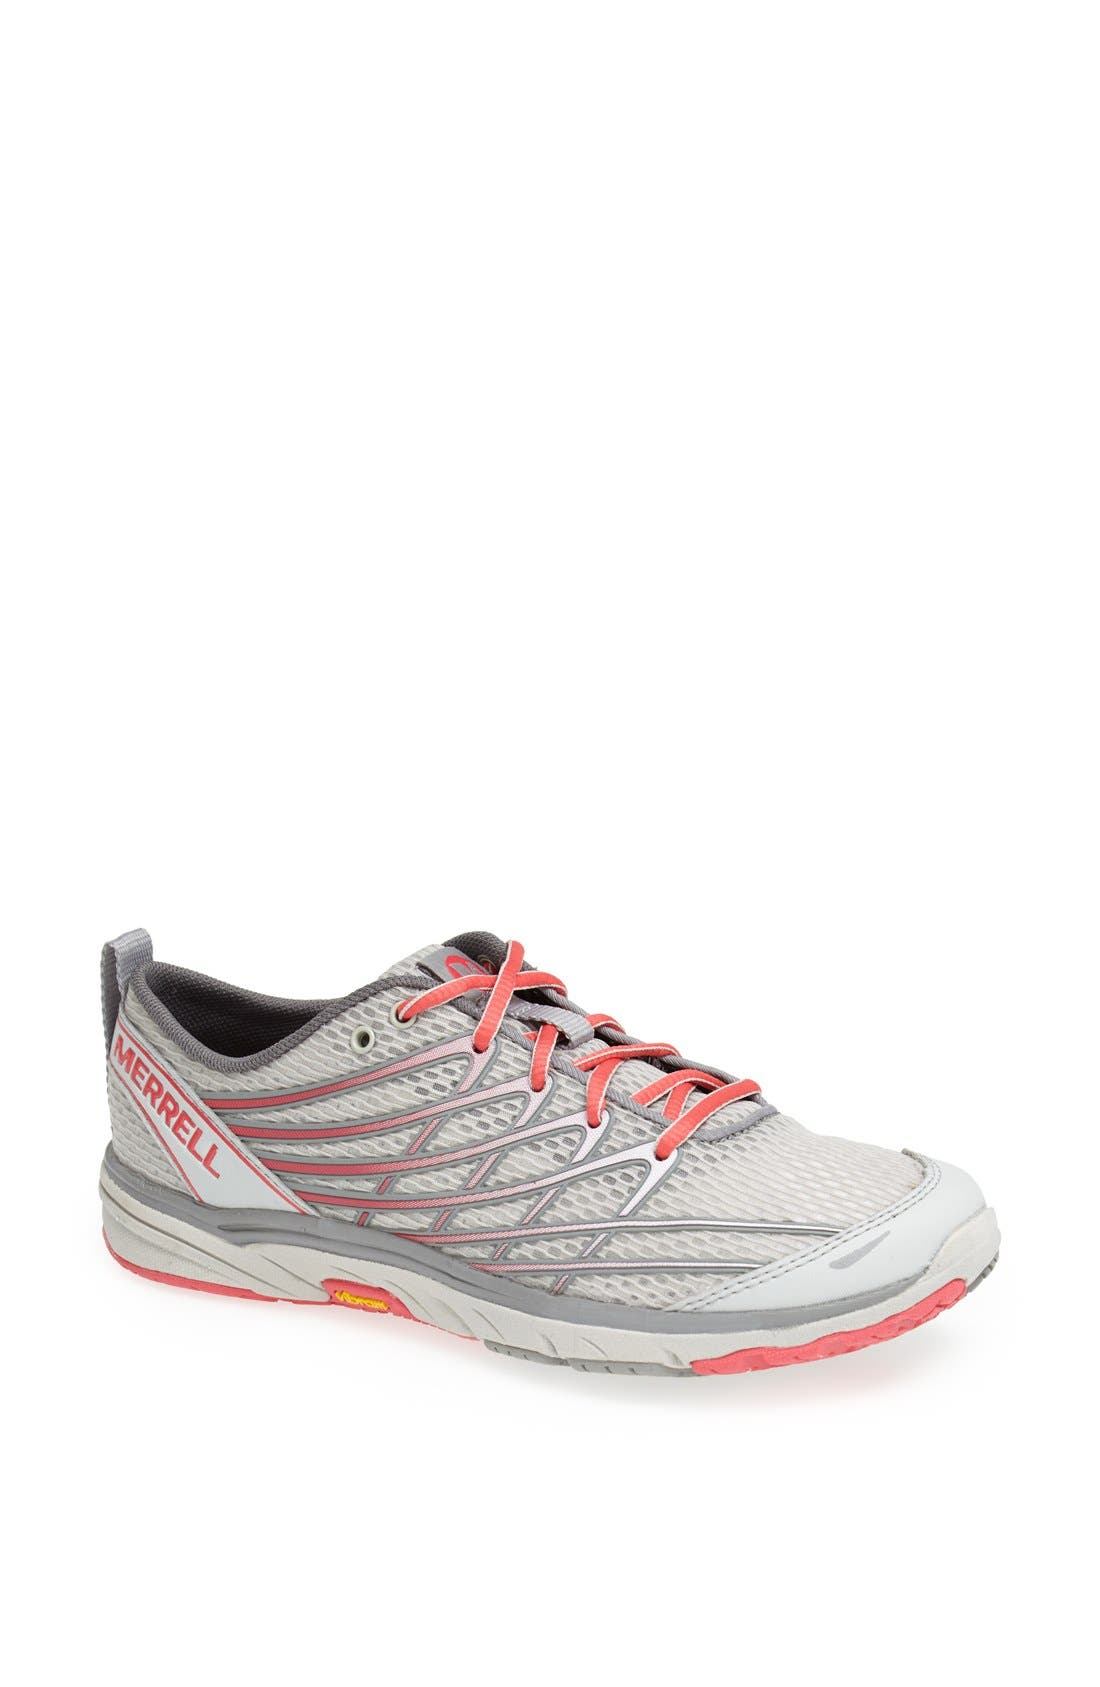 Main Image - Merrell 'Bare Access Arc 3' Running Shoe (Women)